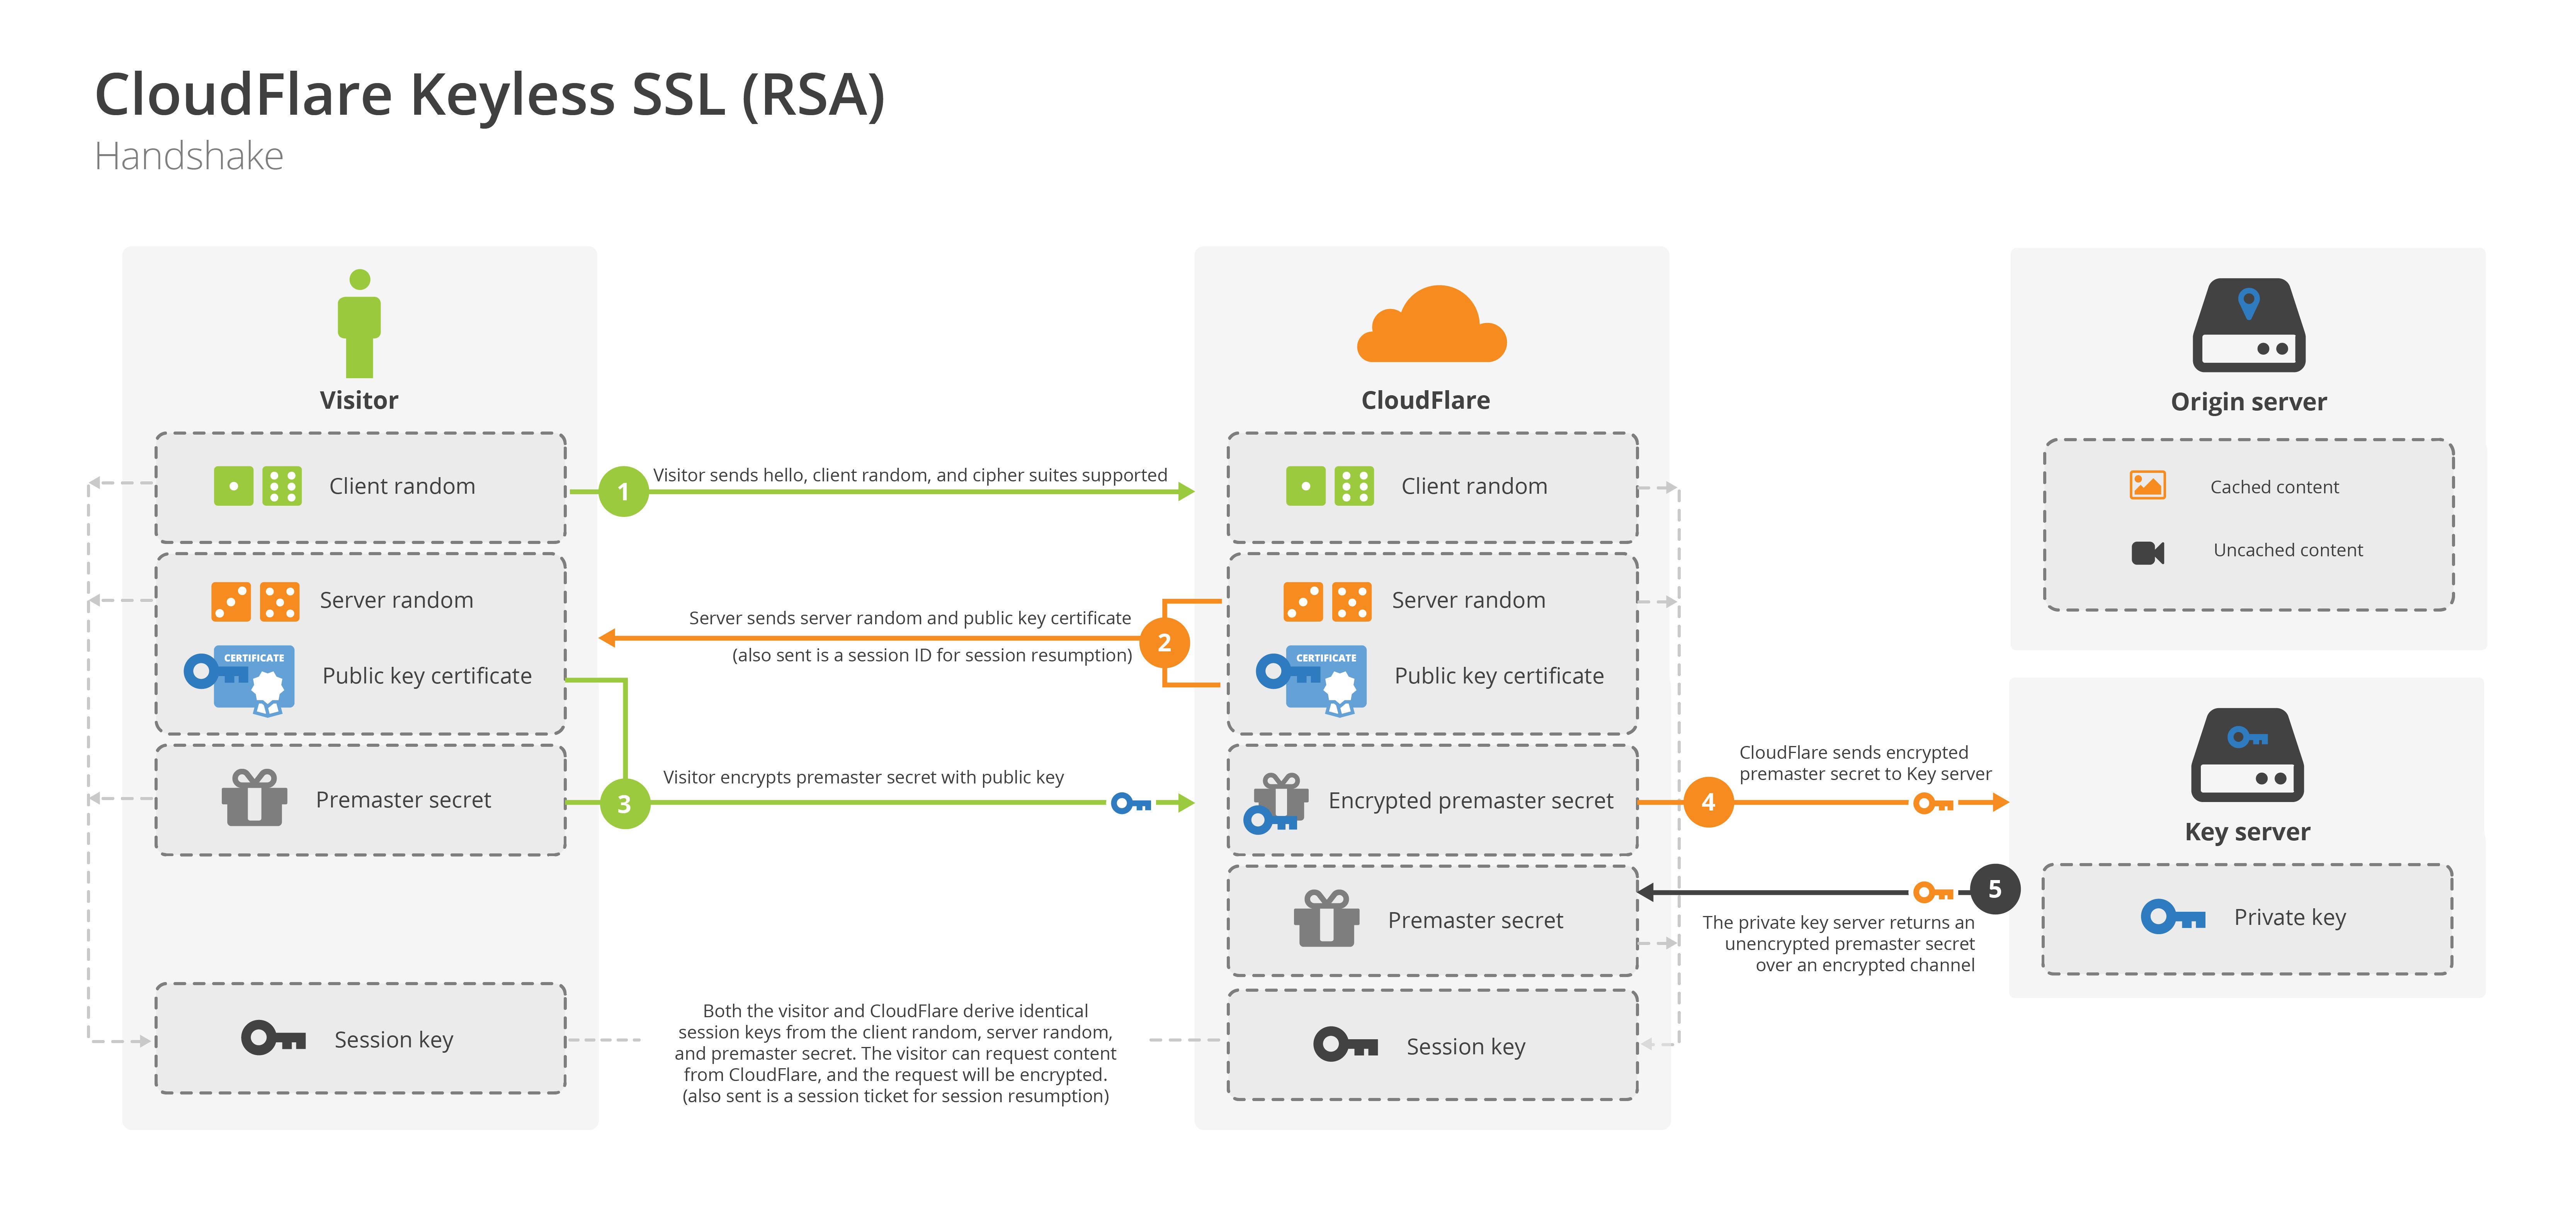 CloudFlare Keyless SSL (RSA)